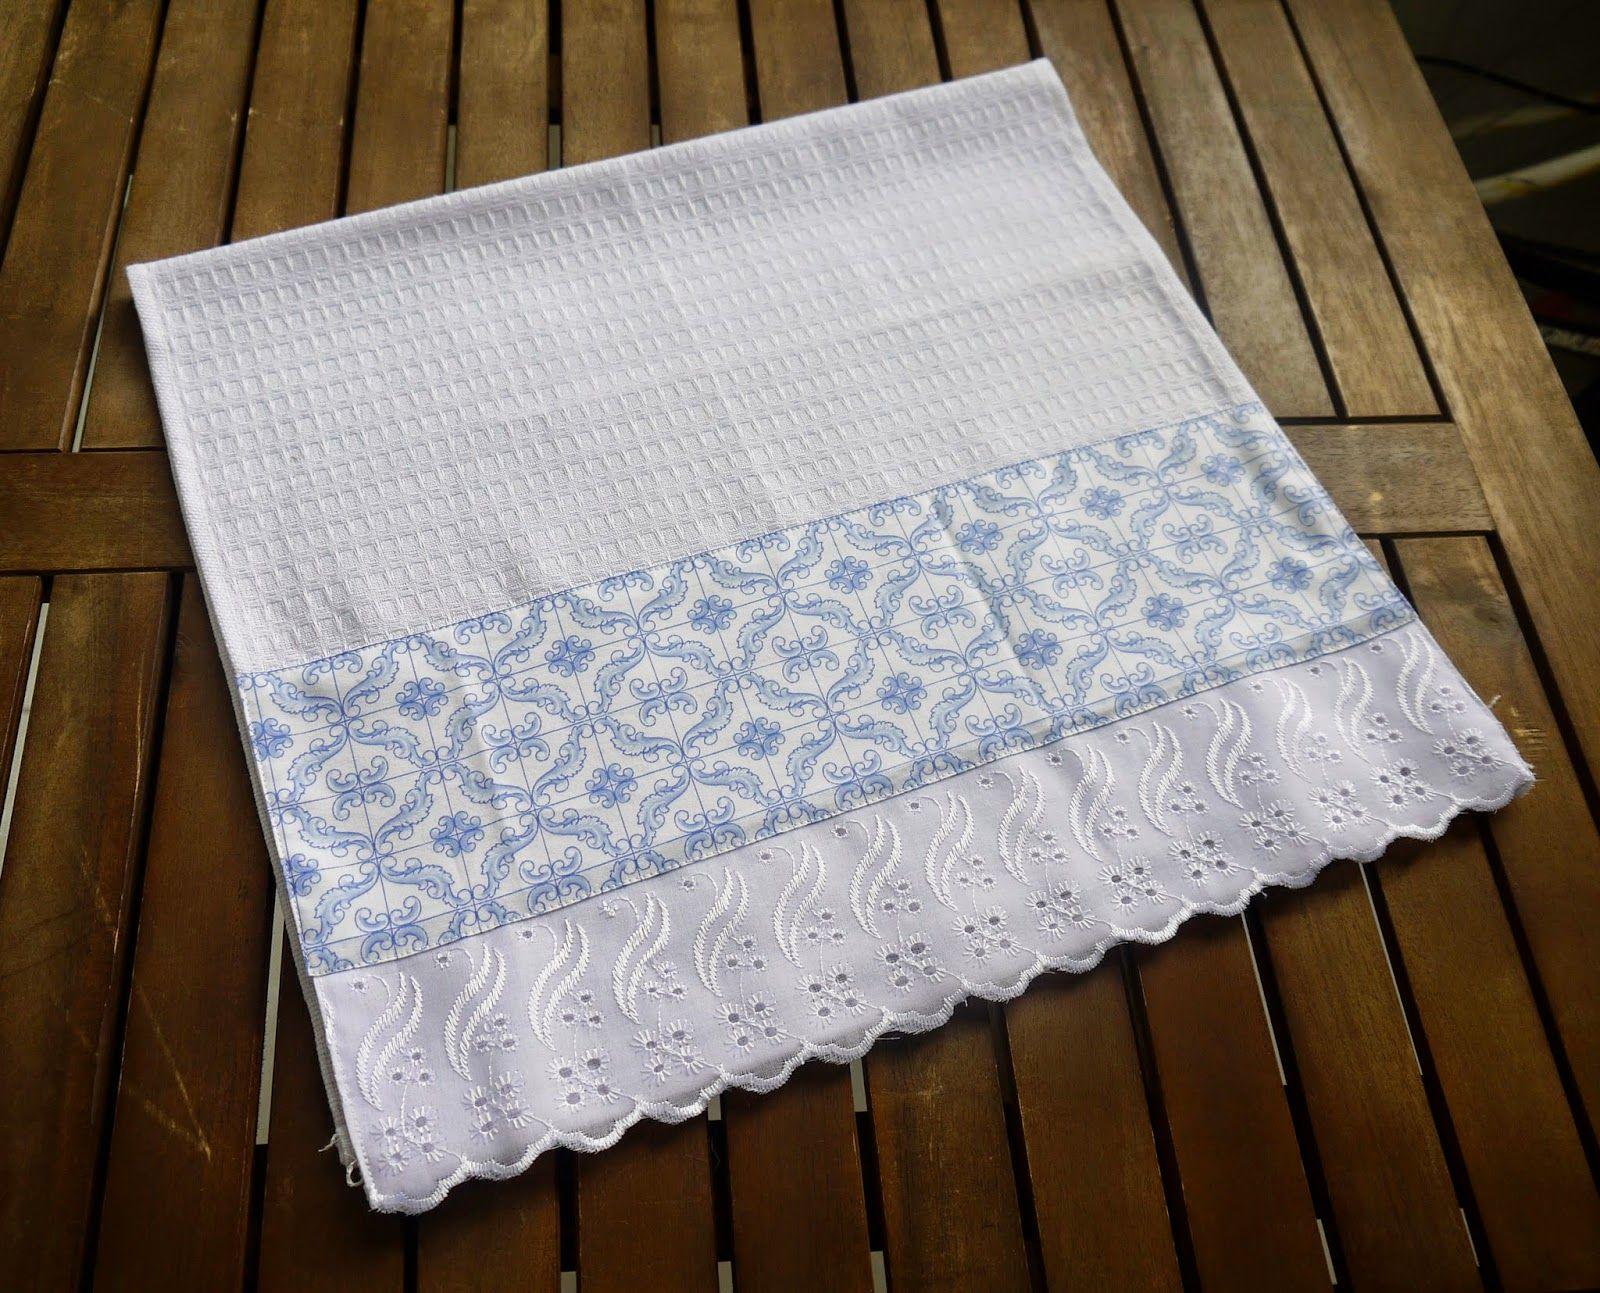 Pin by Sena Patty on Time | Pinterest | Portuguese tiles, Fabrics ...